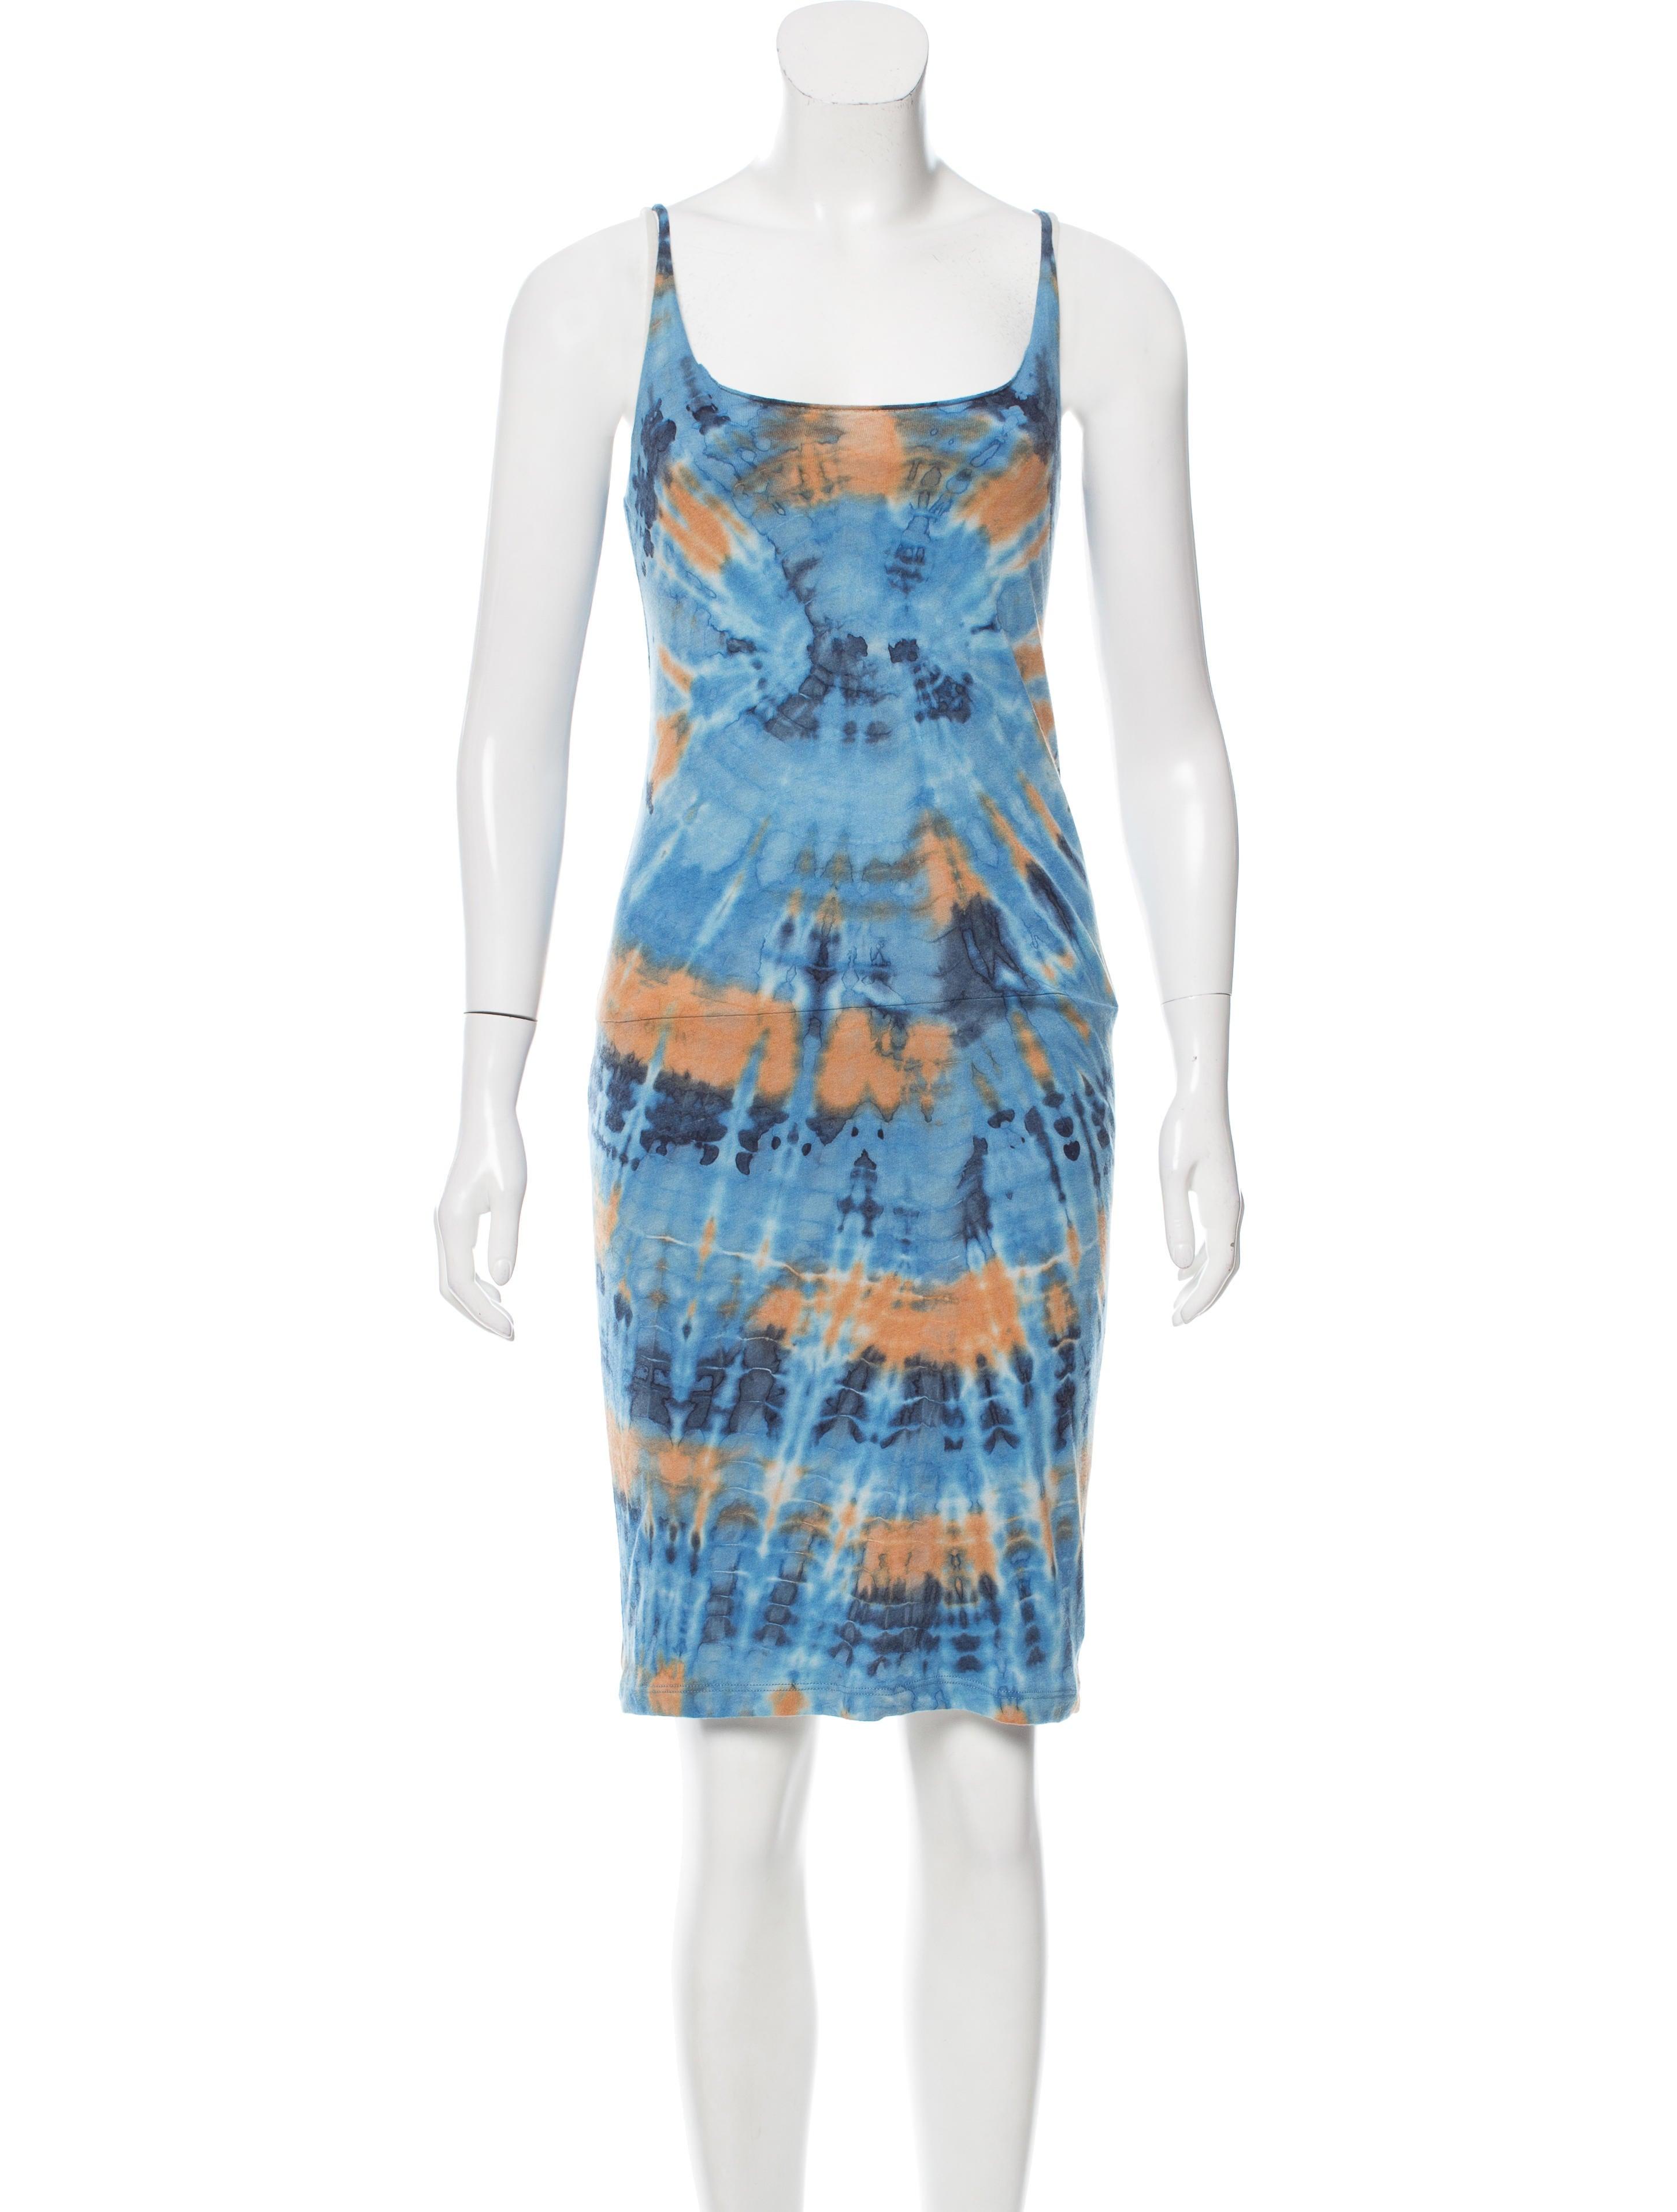 Raquel allegra tie dye sleeveless dress clothing for Tie dye sleeveless shirts